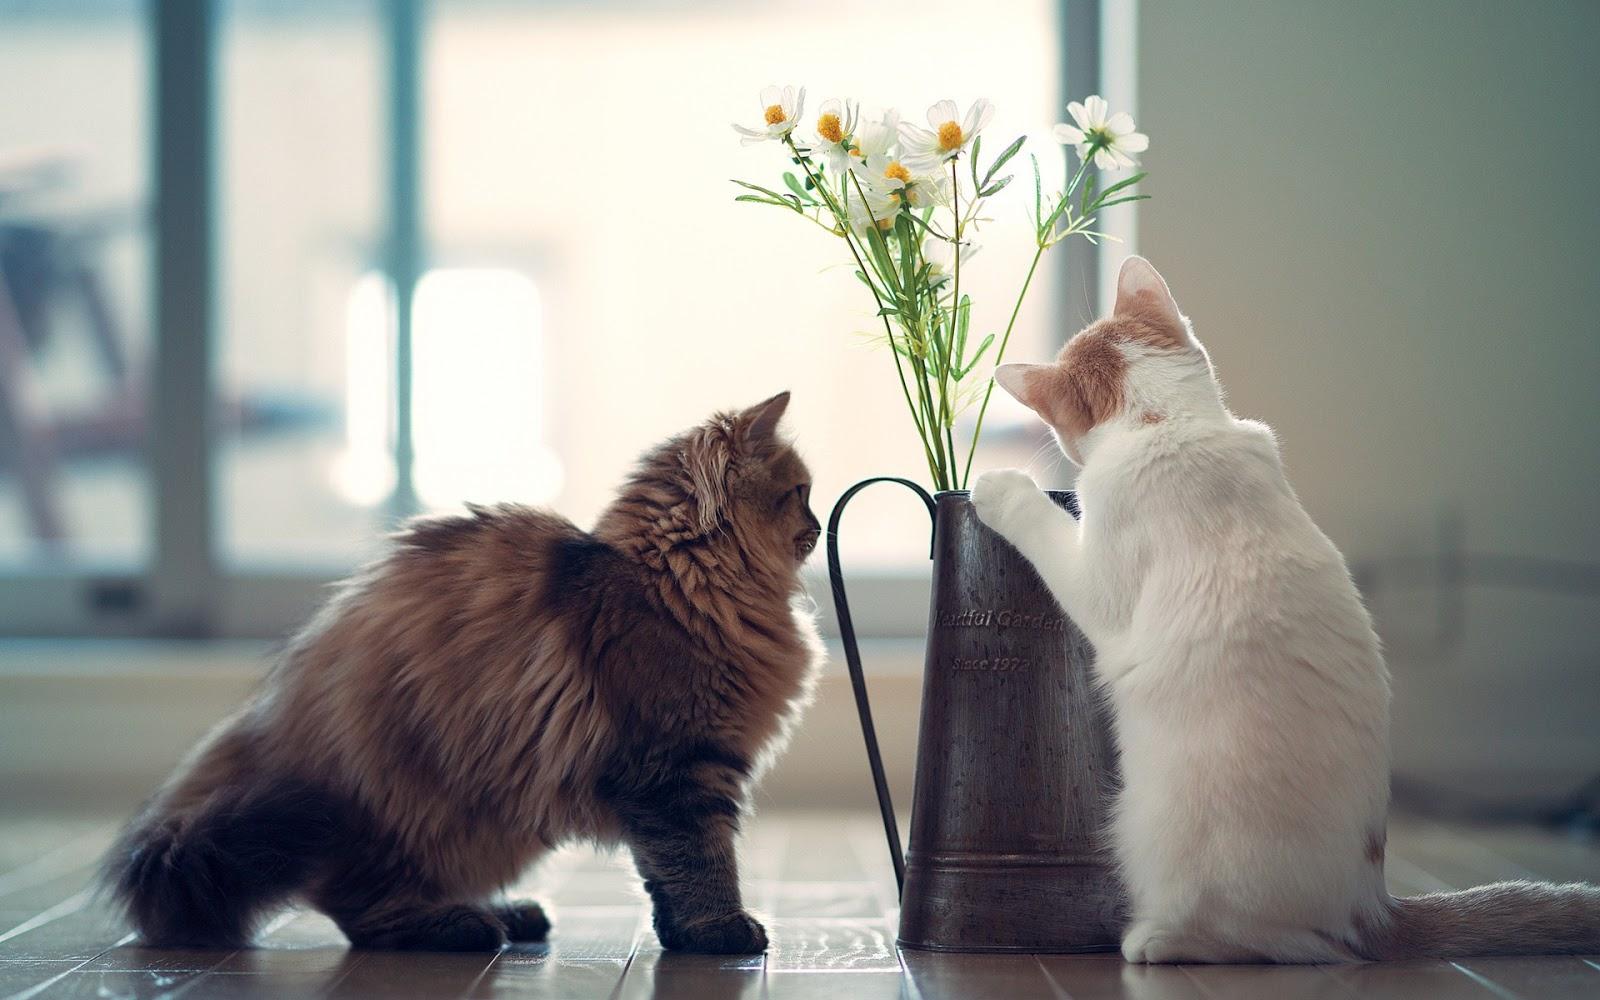 vase pictures